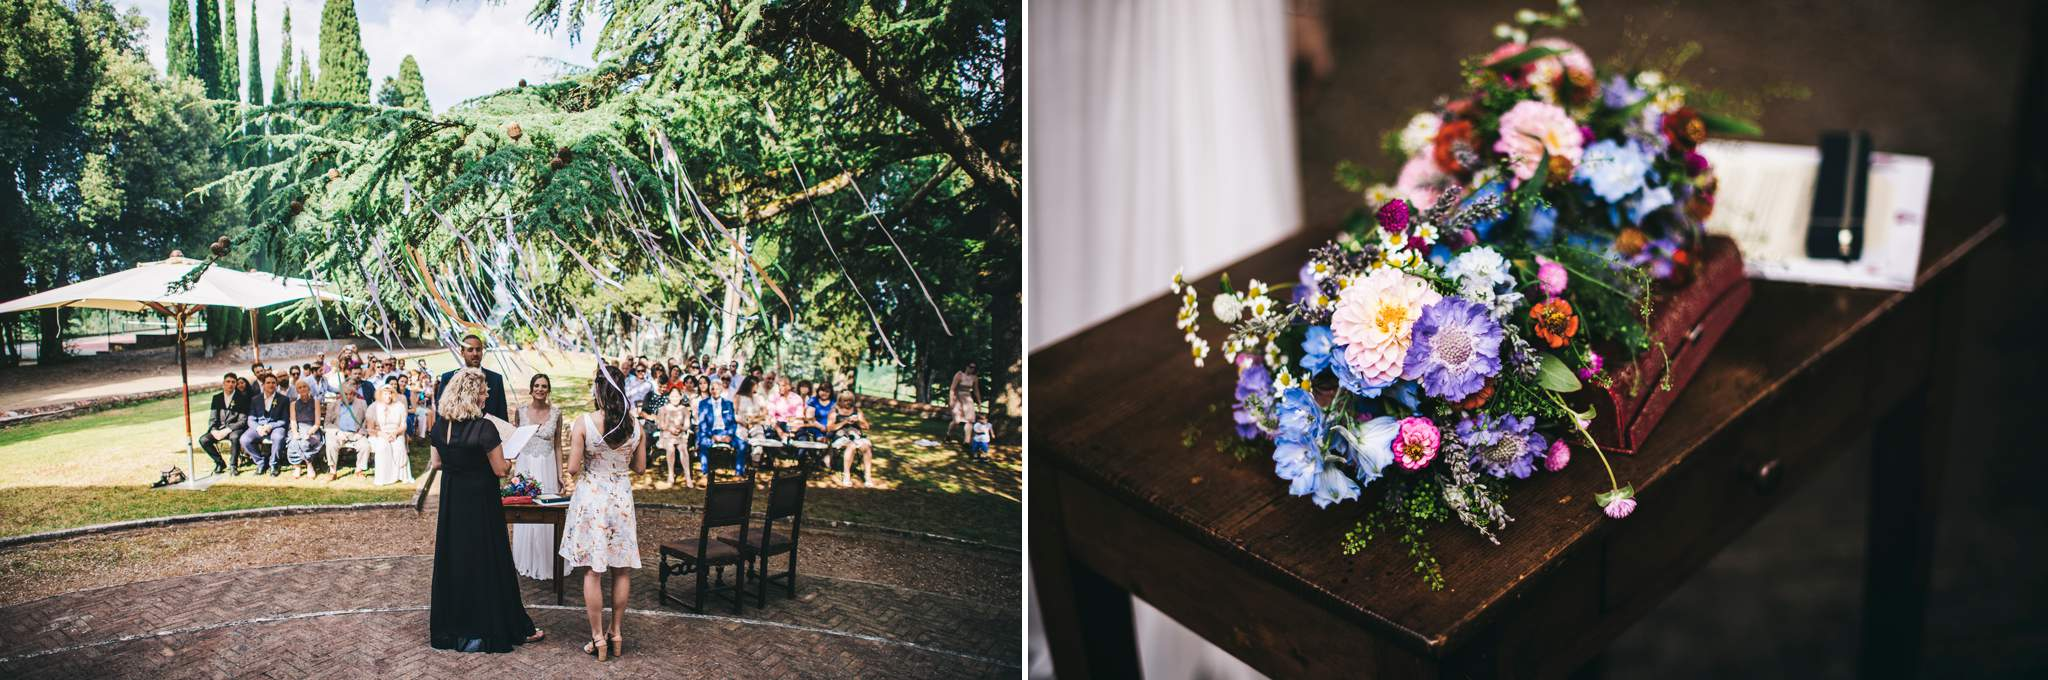 12wedding-photographer-villa-petrolo